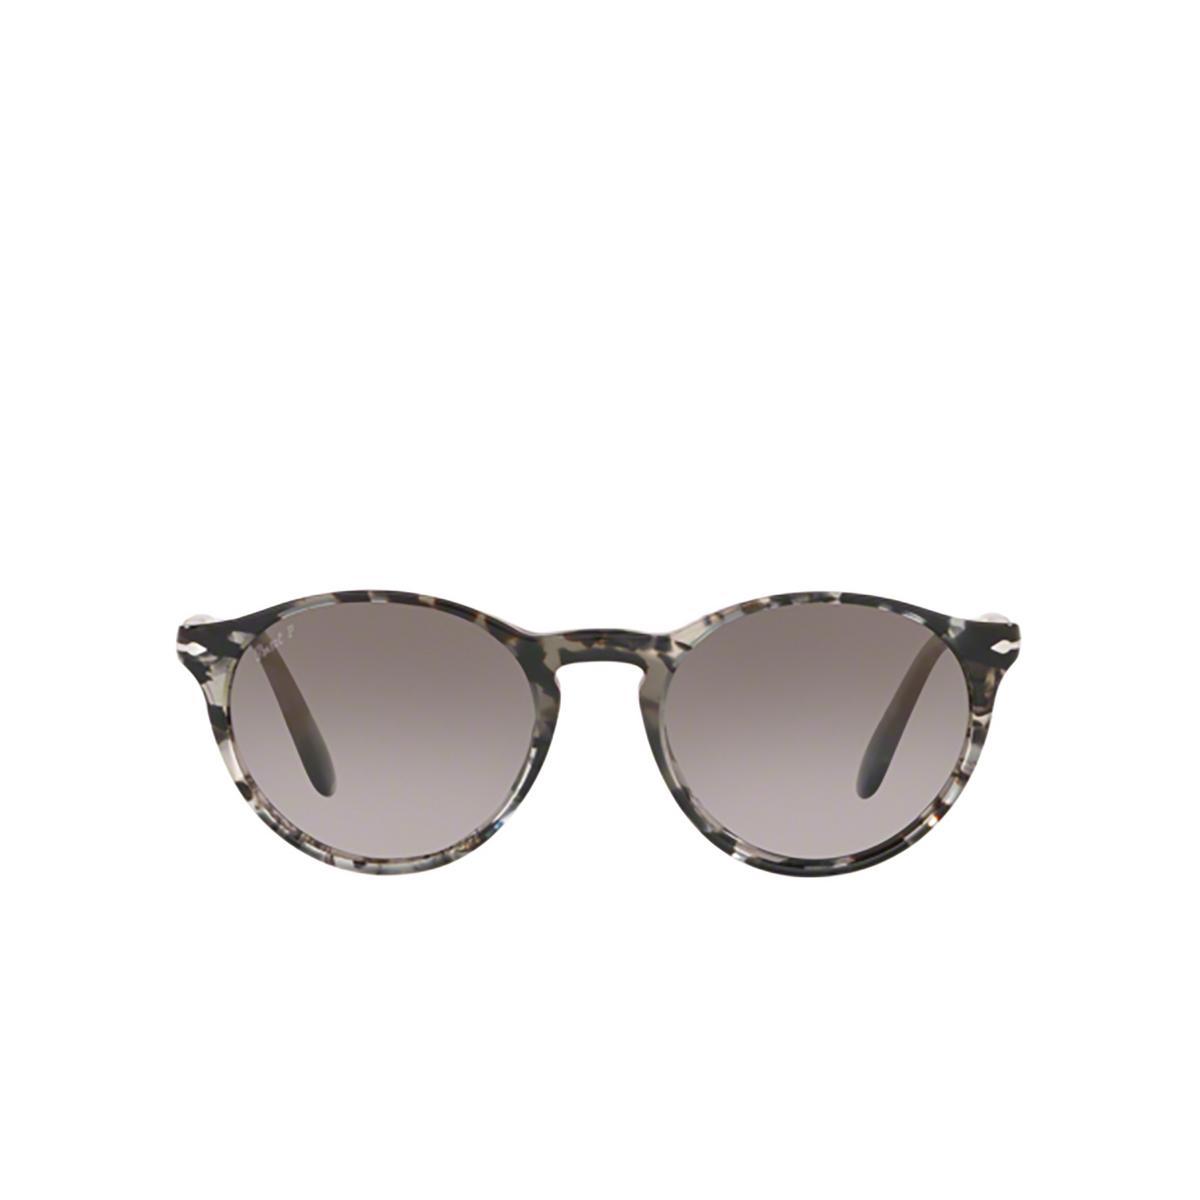 Persol® Round Sunglasses: PO3092SM color Grey Tortoise 9057M3 - front view.